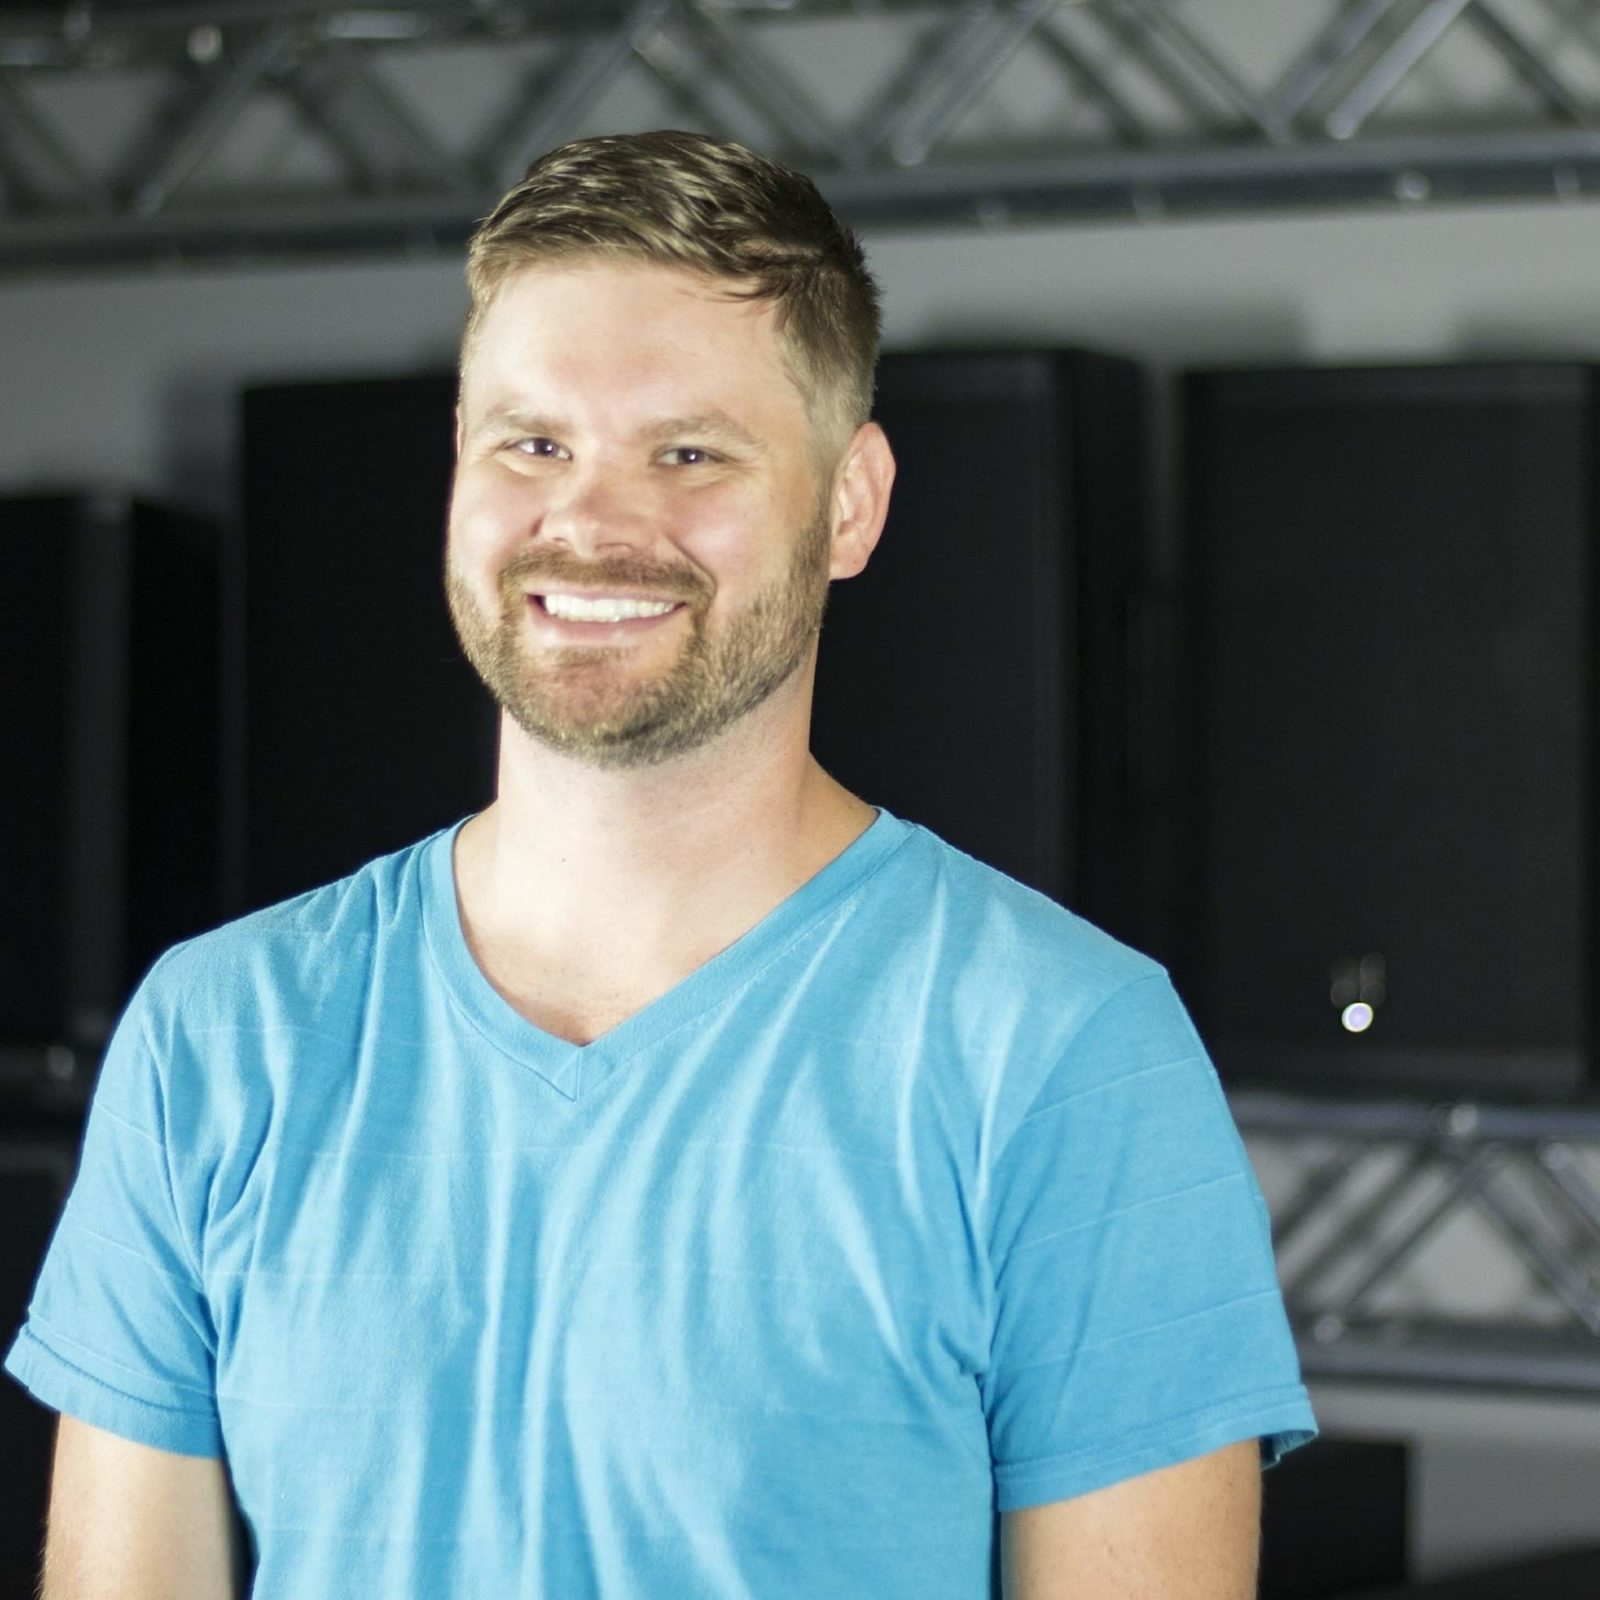 Music producer in Utah